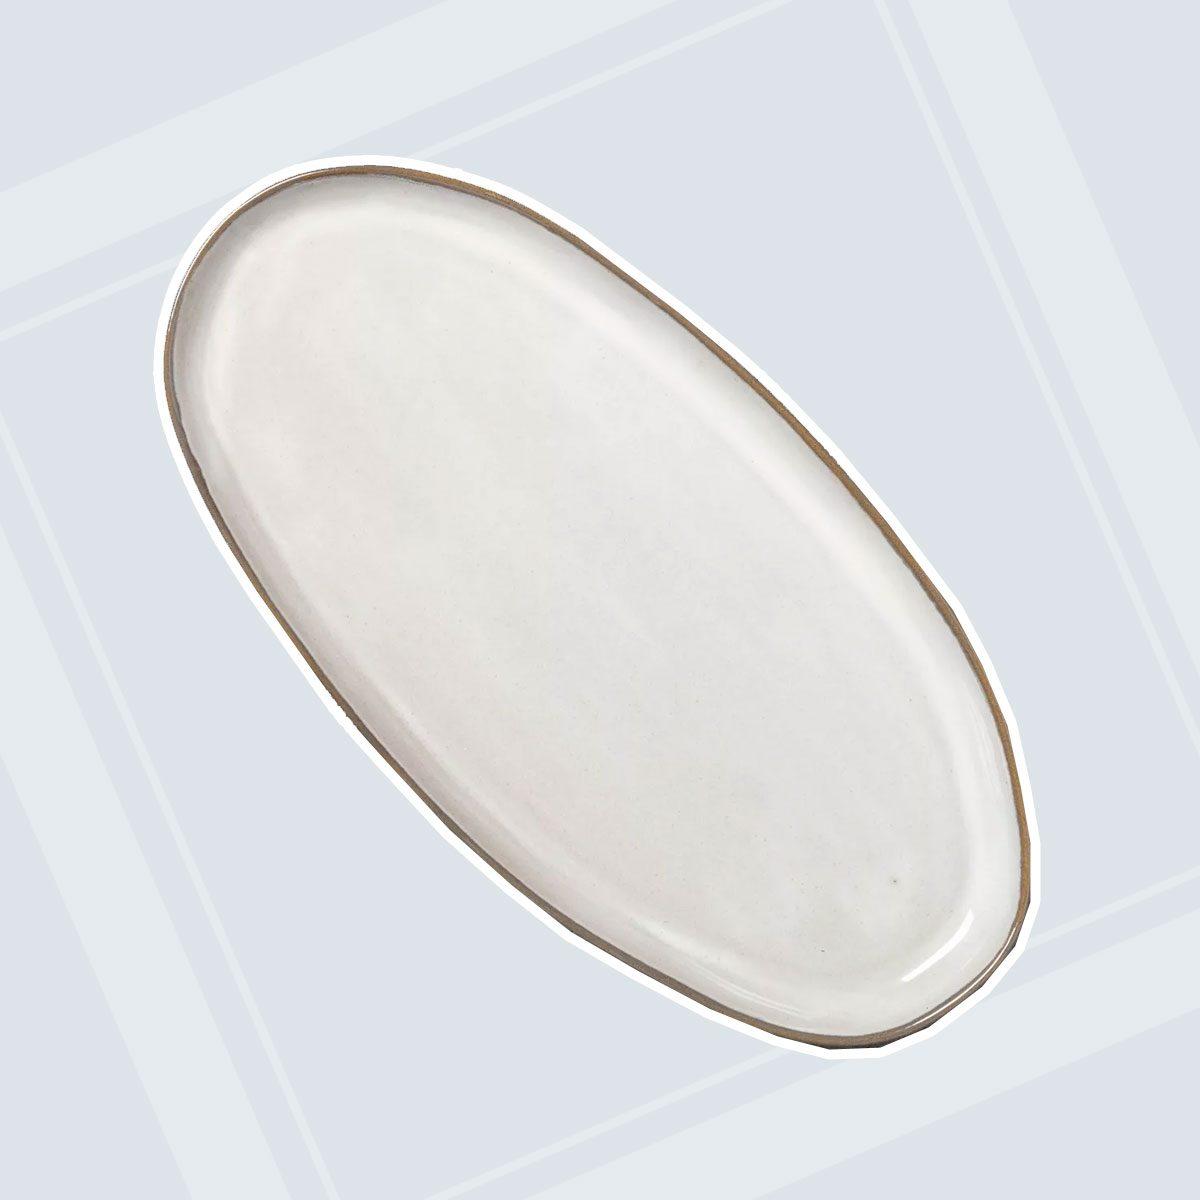 Stoneware Reactive Glaze Oval Serve Tray - Hearth & Hand™ with Magnolia